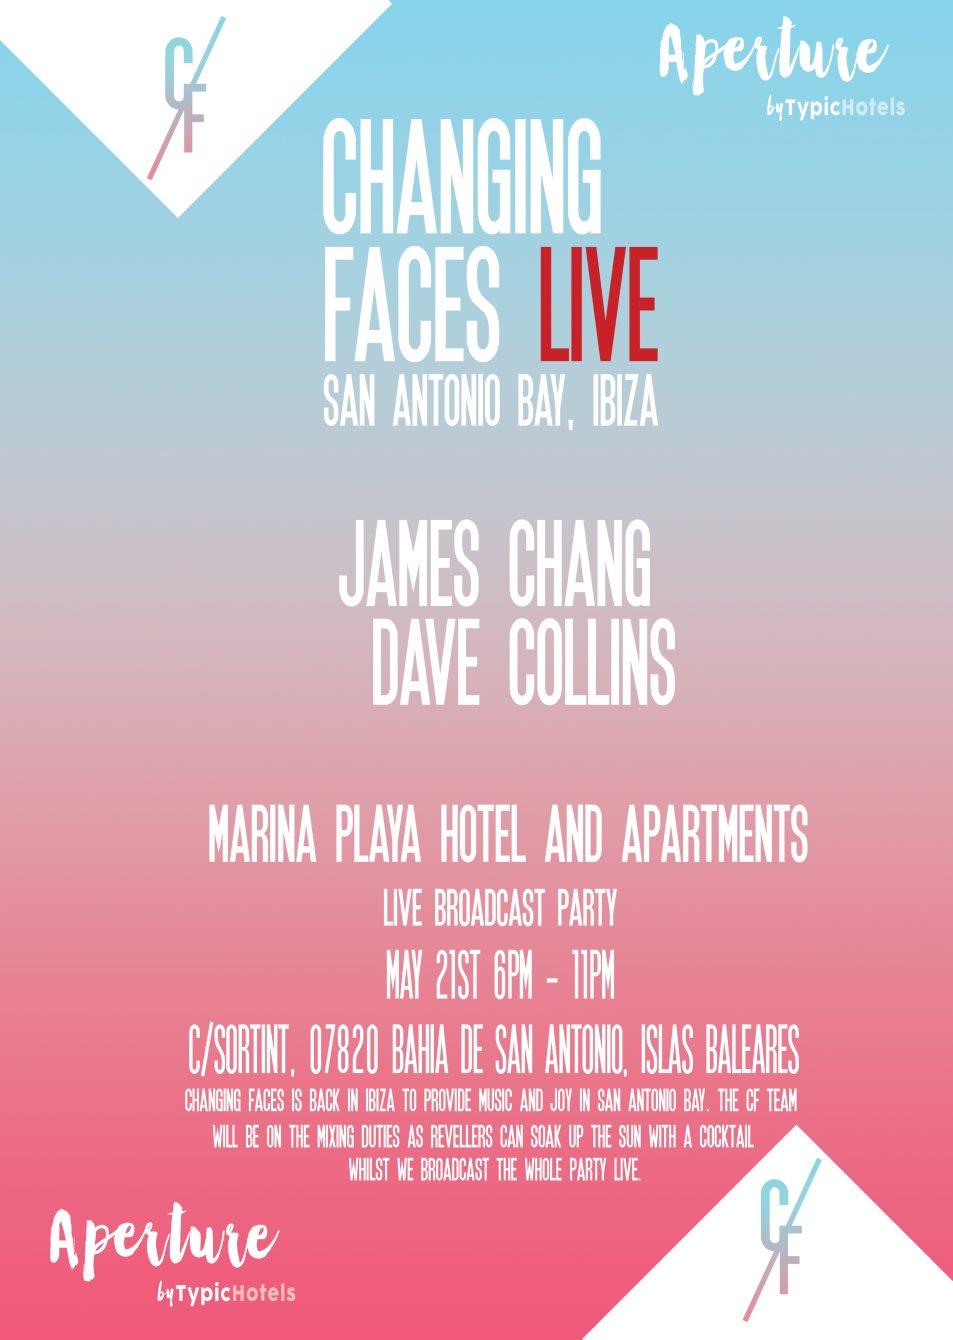 Changing Faces Live San Antonio Bay, Ibiza - Flyer front